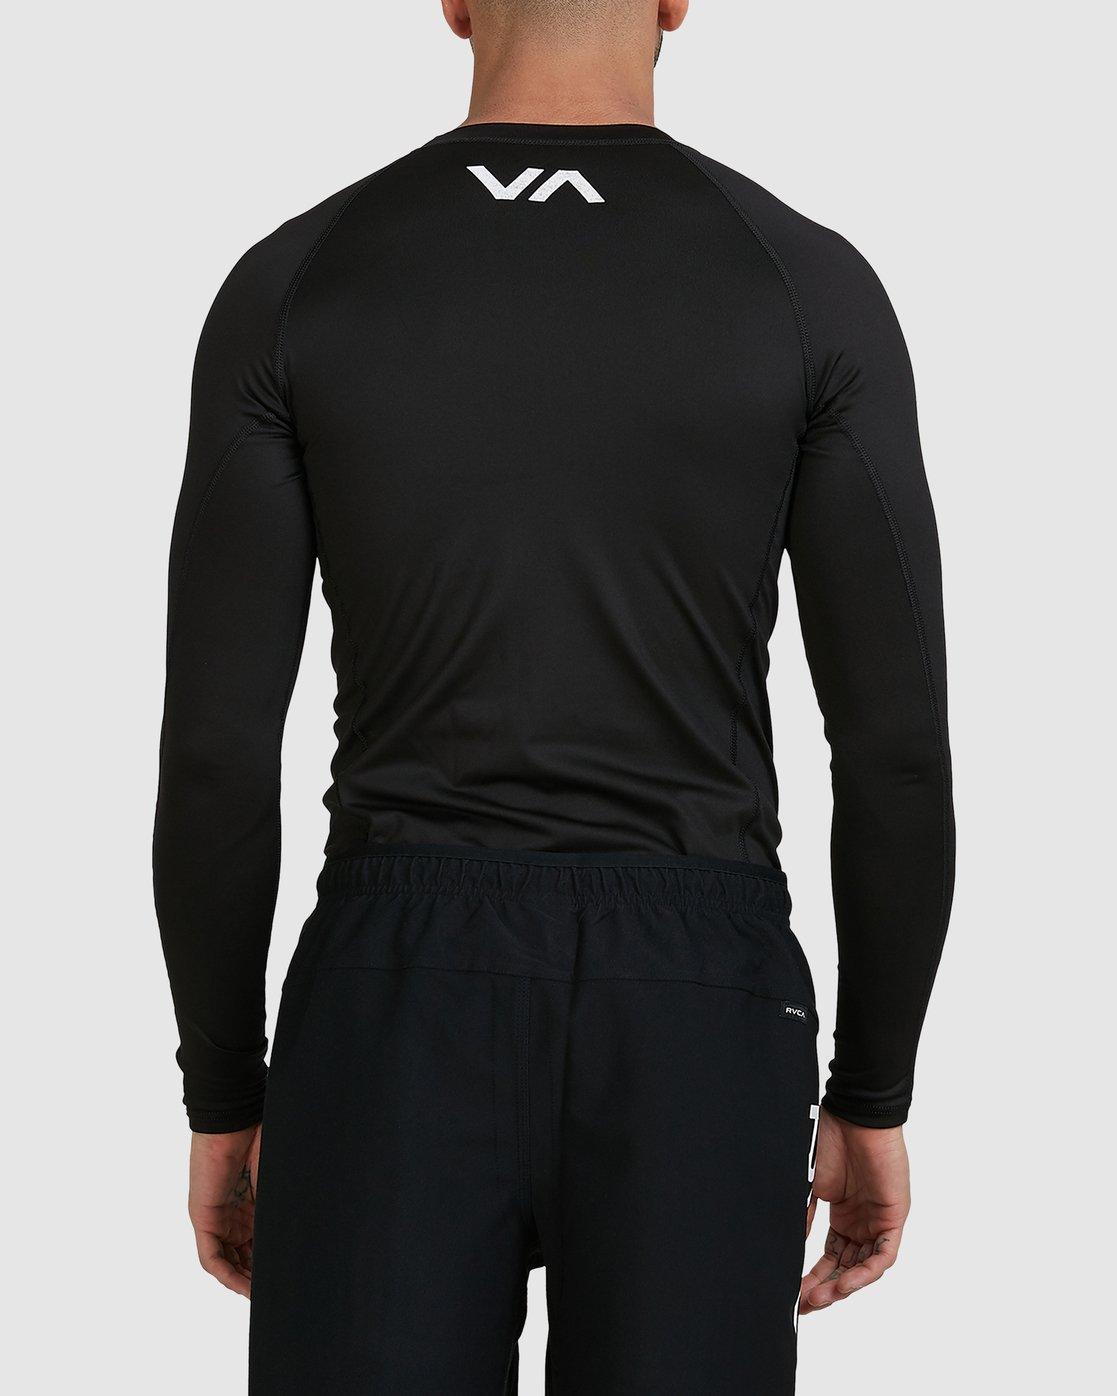 11 Sport Long Sleeve Rashguard Black R381661 RVCA